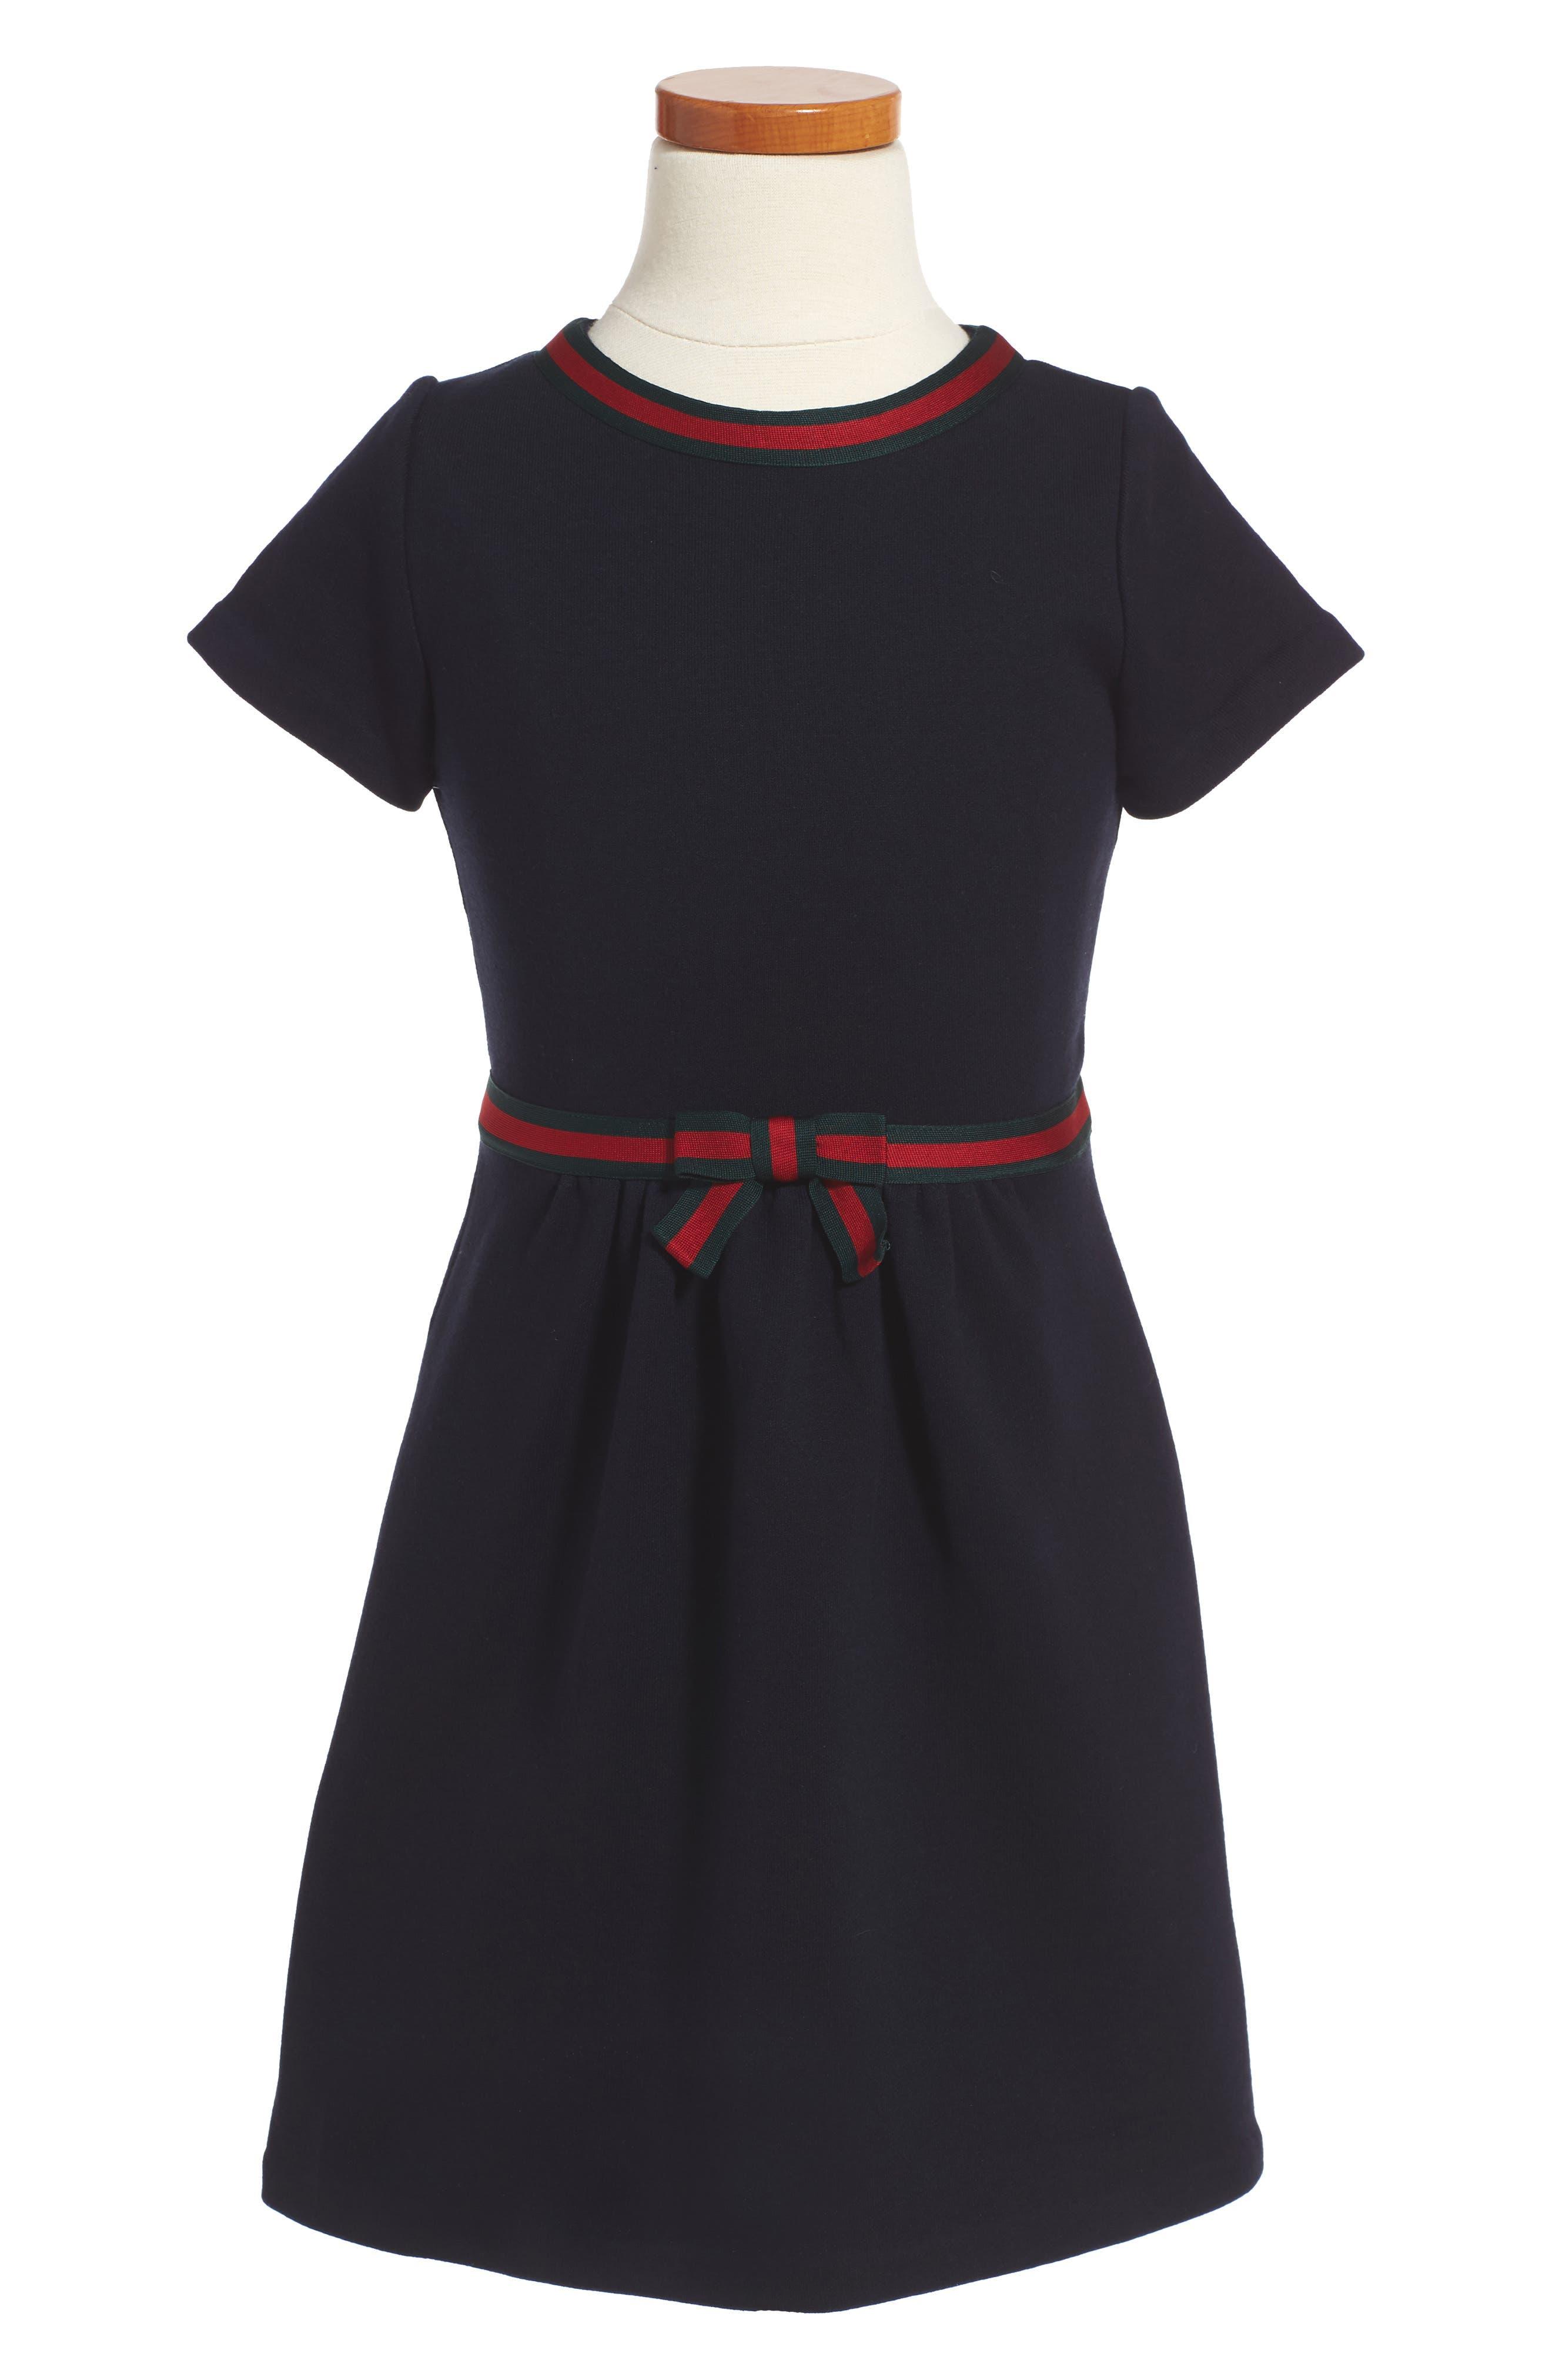 Alternate Image 1 Selected - Gucci Stripe A-Line Dress (Little Girls & Big Girls)